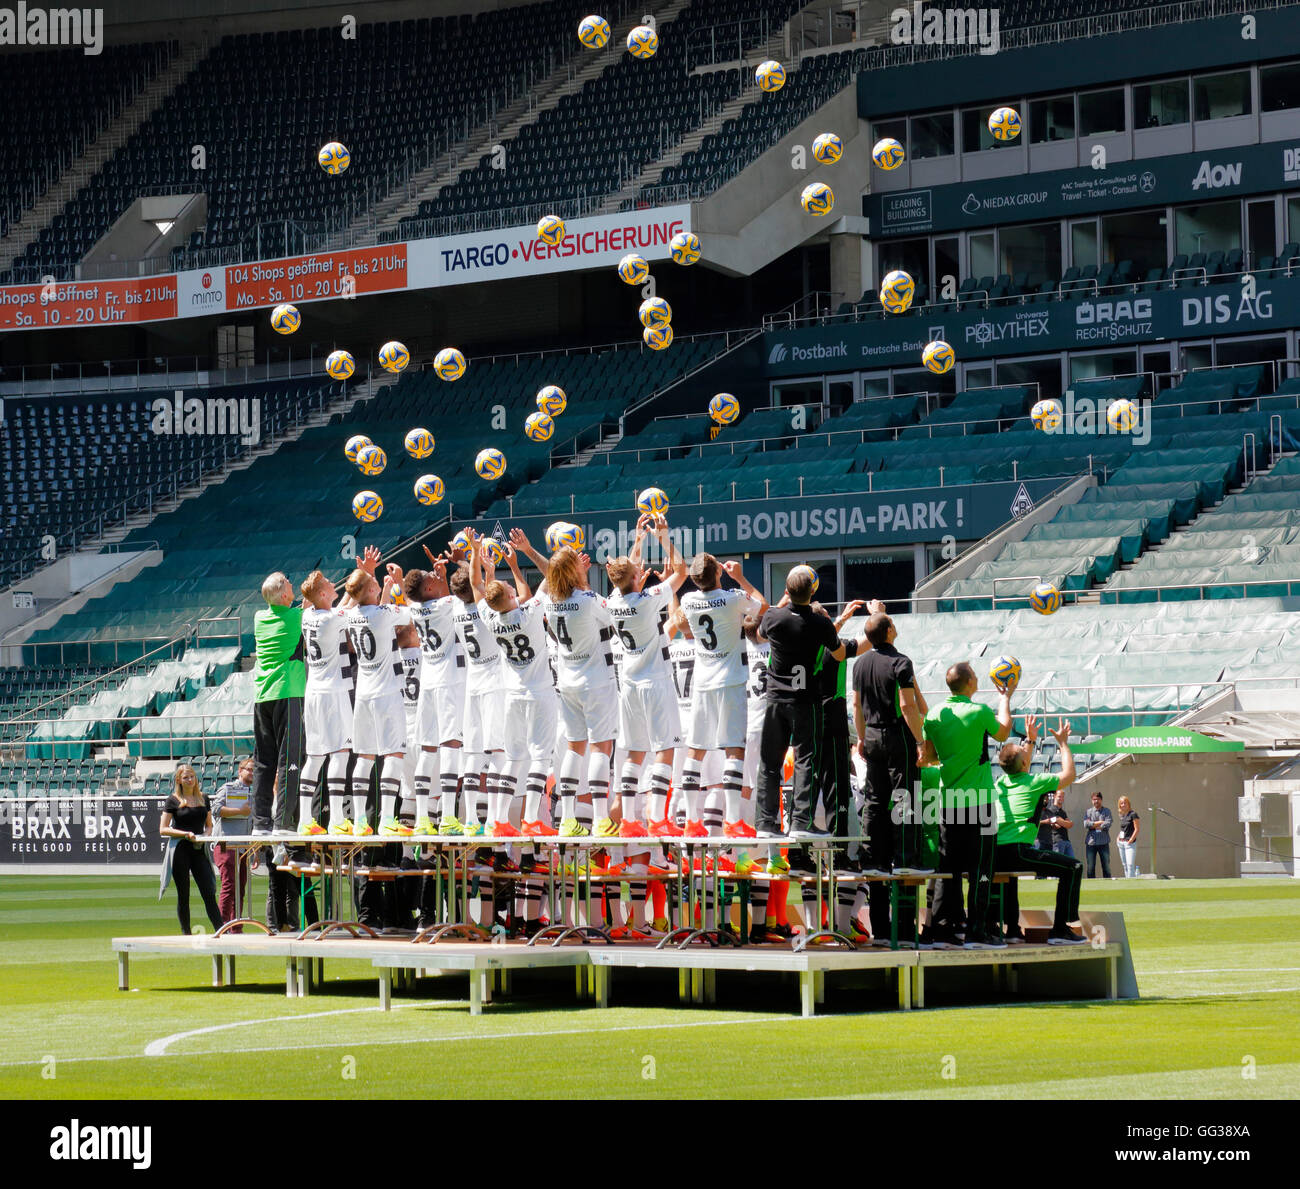 football, Bundesliga, 2016/2017, team shot of Borussia Moenchengladbach, press photo shooting, football players - Stock Image